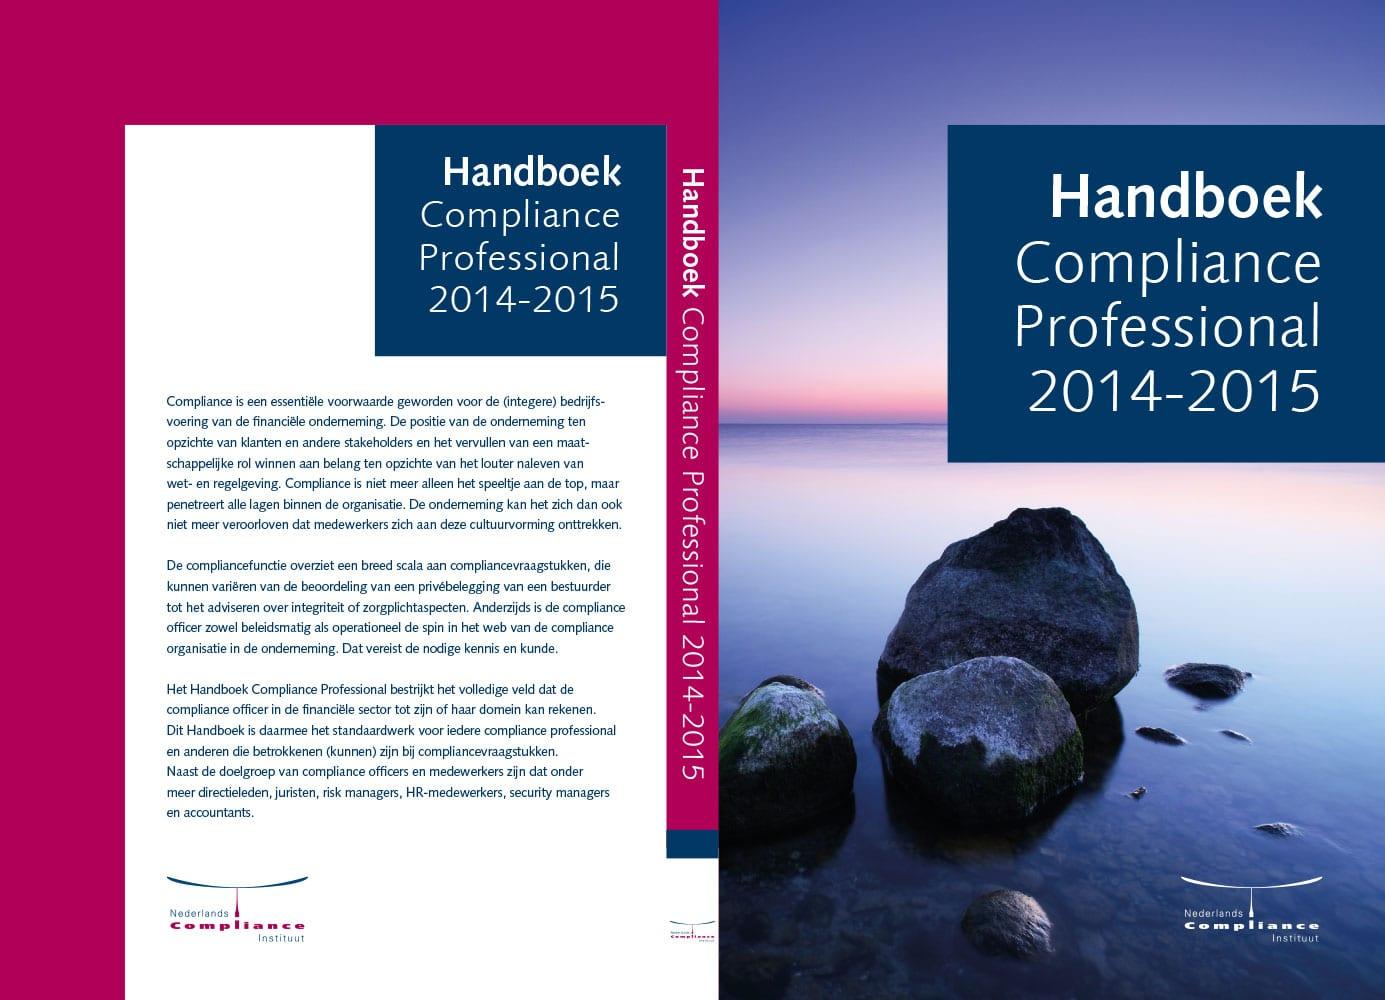 Handboek Compliance Professional 2015 omslag